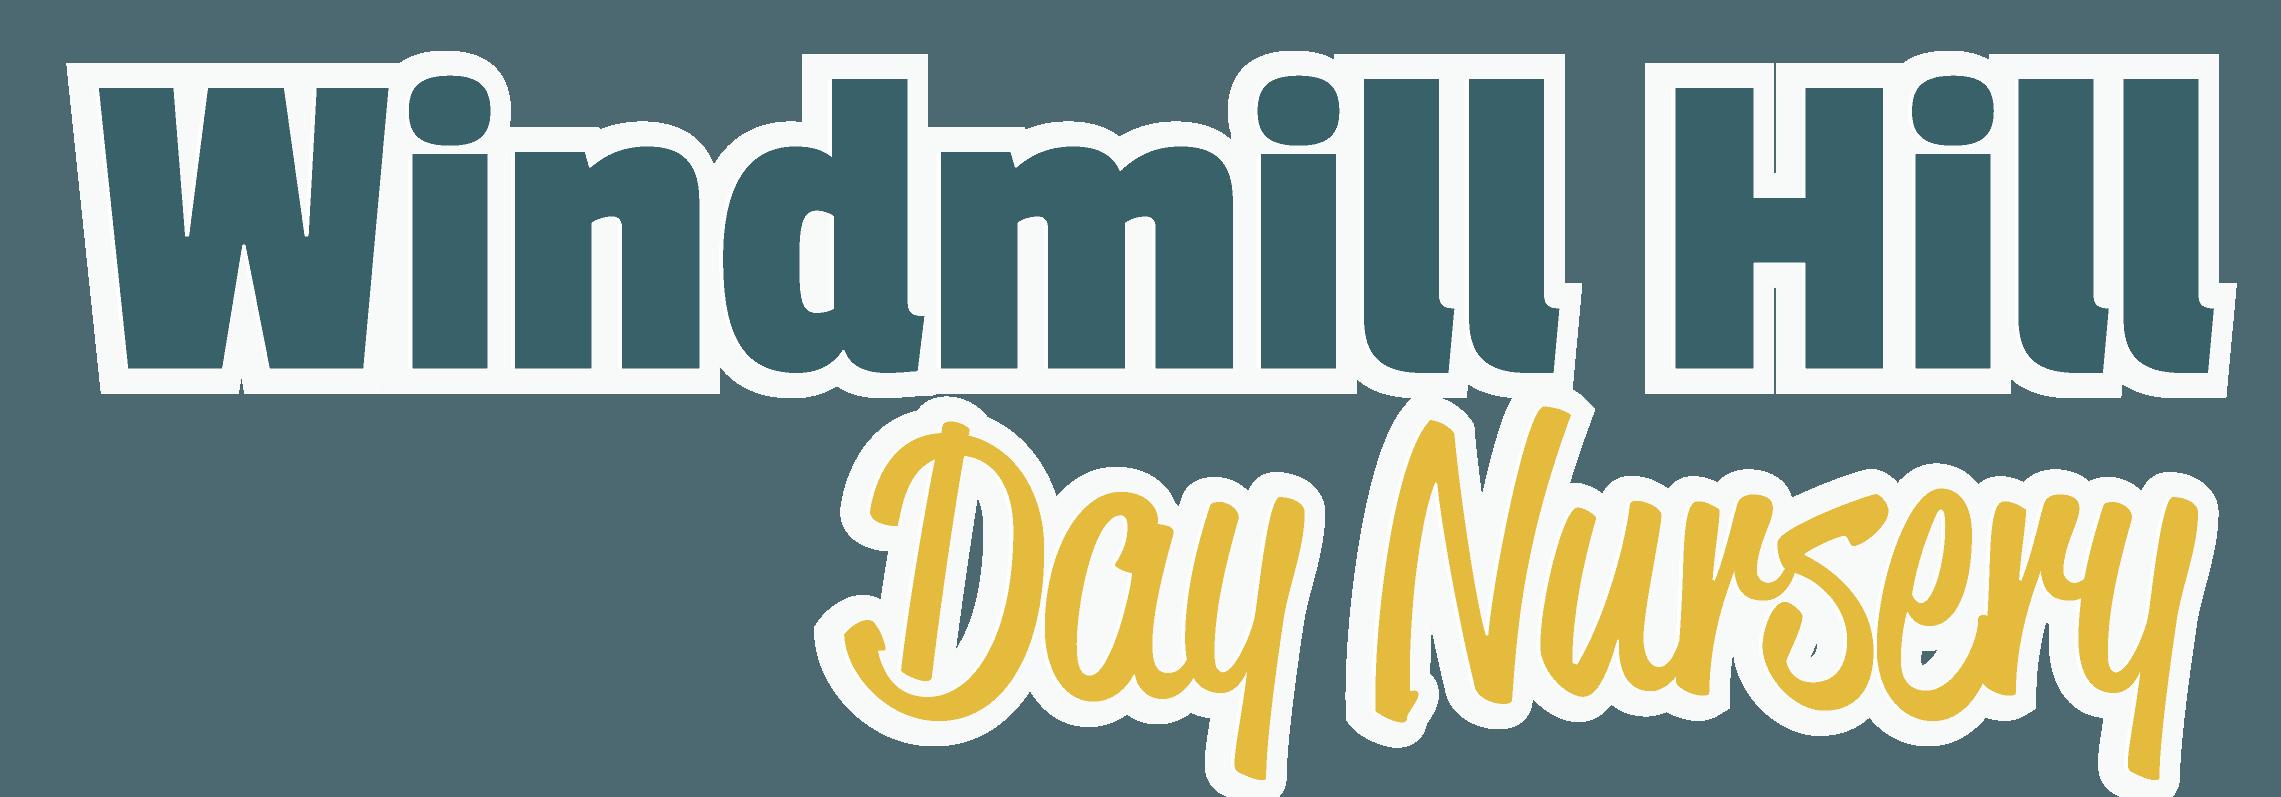 Windmill Hill Day Nursery logo